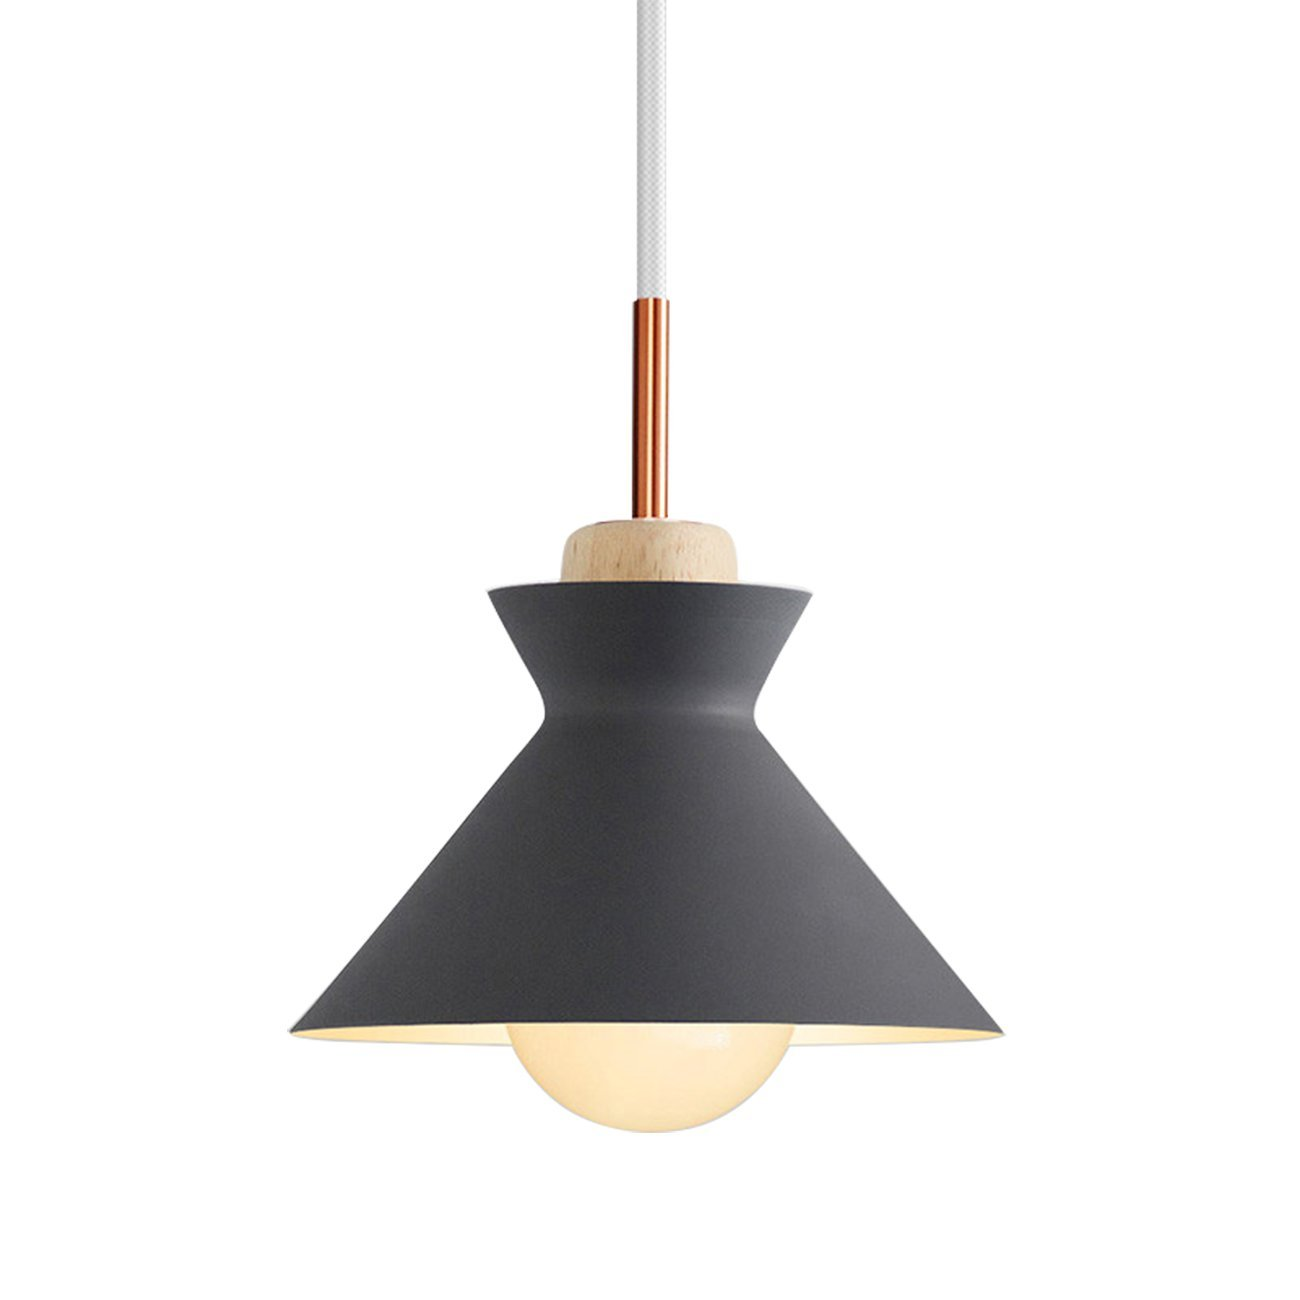 Nordic Modern Pendant Ceiling Light Nordic Macaron Aluminum+Wood Chandelier Fixture Kitchen Pendant Lighting Living Room Pendant Lighting-UL Certification (Grey-B)